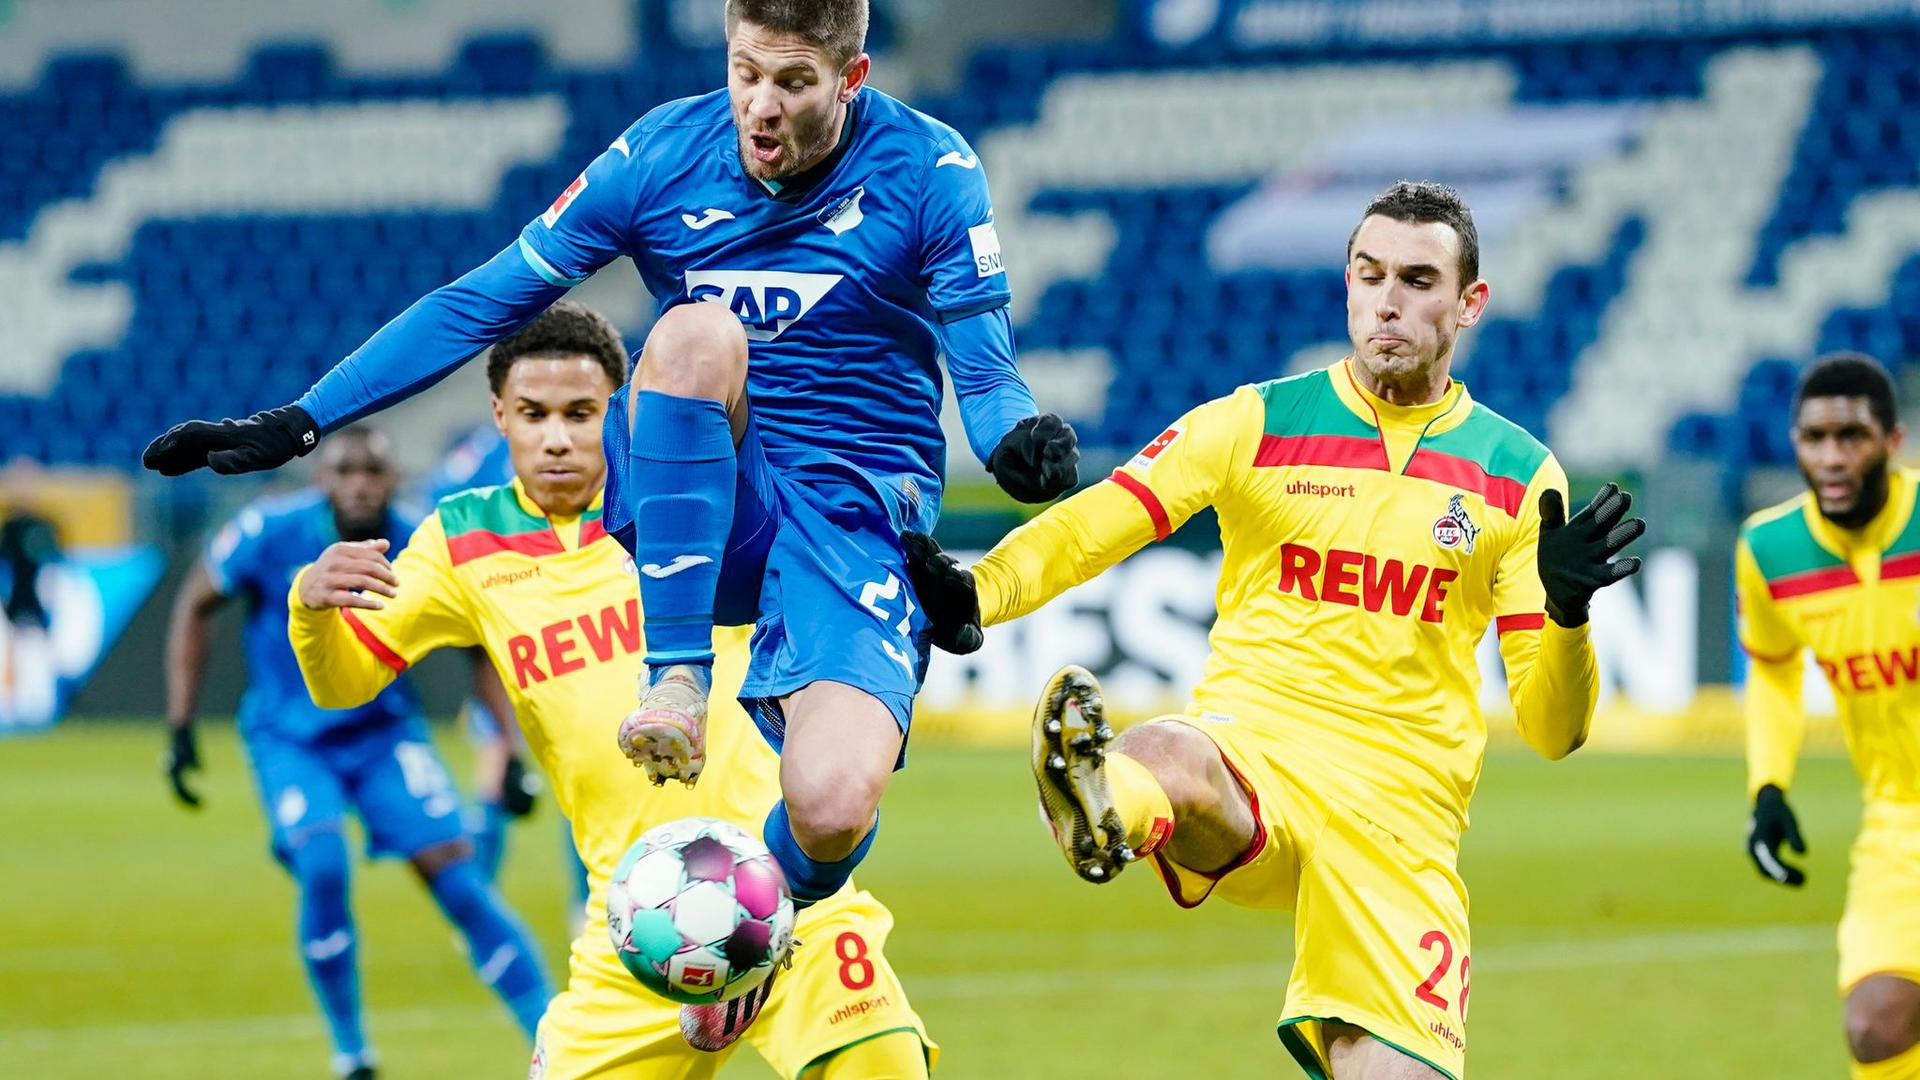 Kölns Ismail Jakobs (l-r), Hoffenheims Andrej Kramaric und Kölns Ellyes Skhiri kämpfen um den Ball.